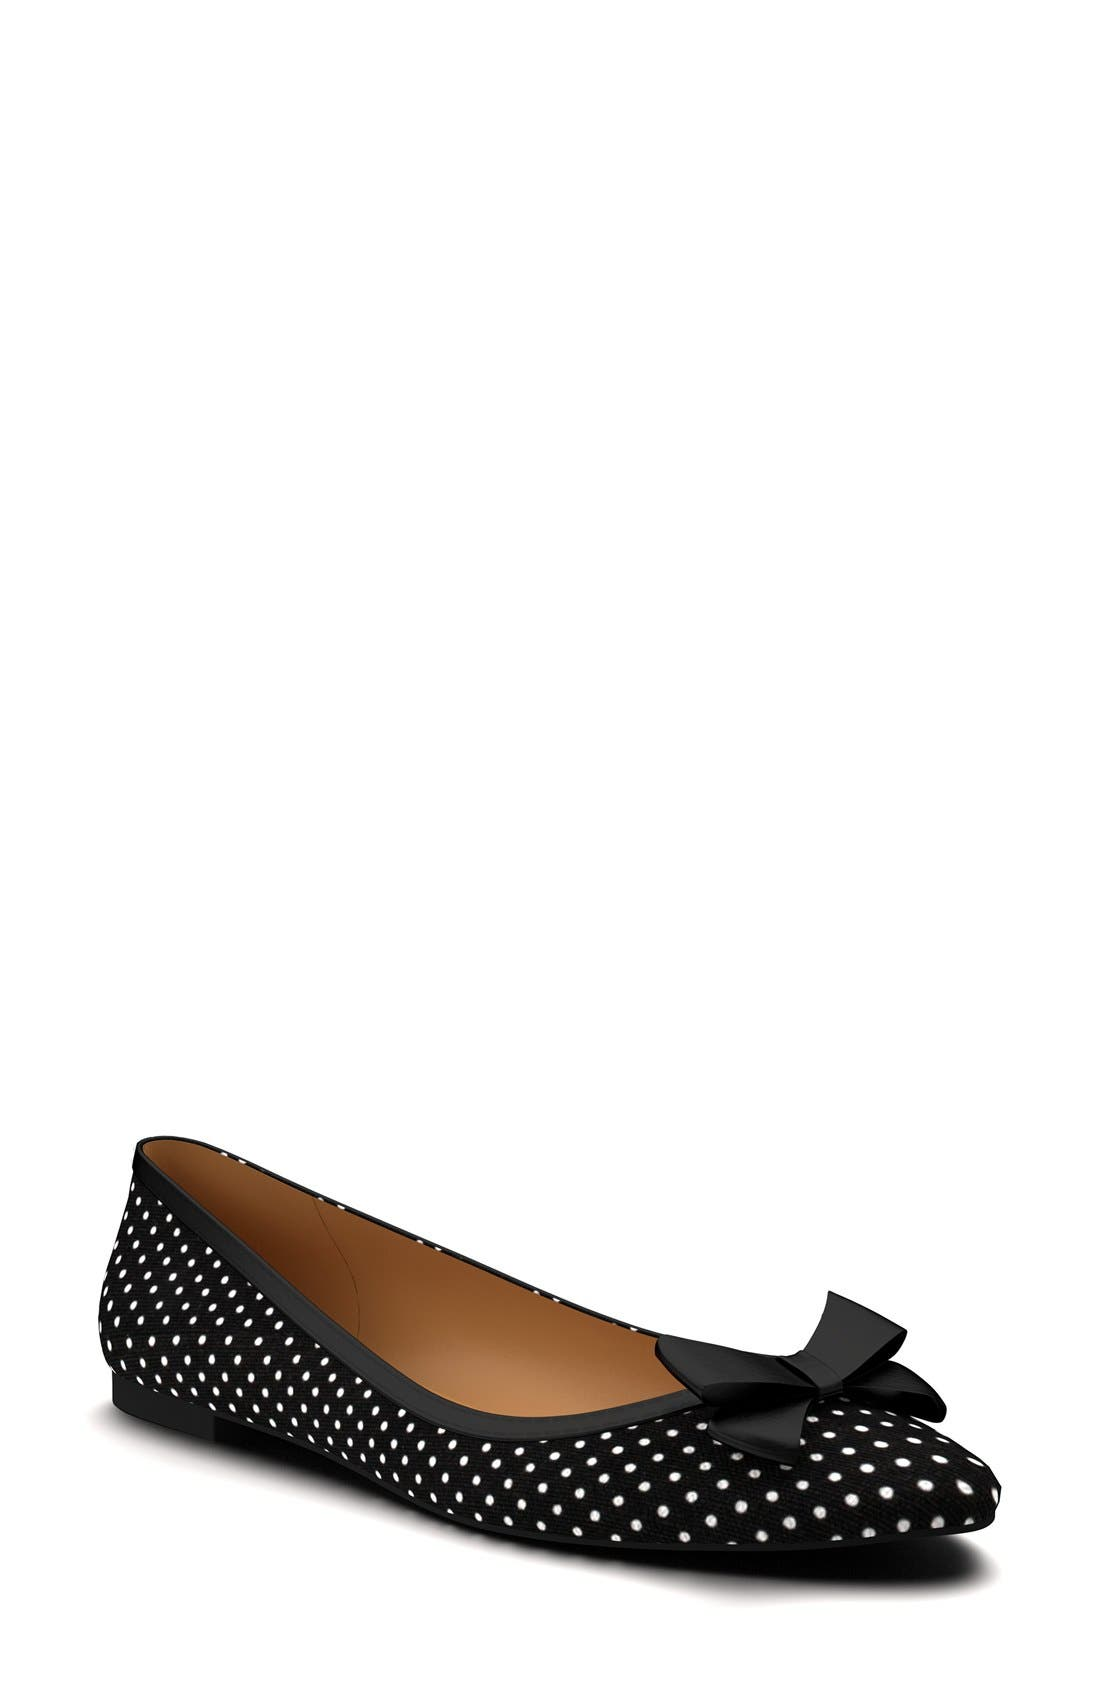 Main Image - Shoes of Prey Polka Dot Ballet Flat (Women)